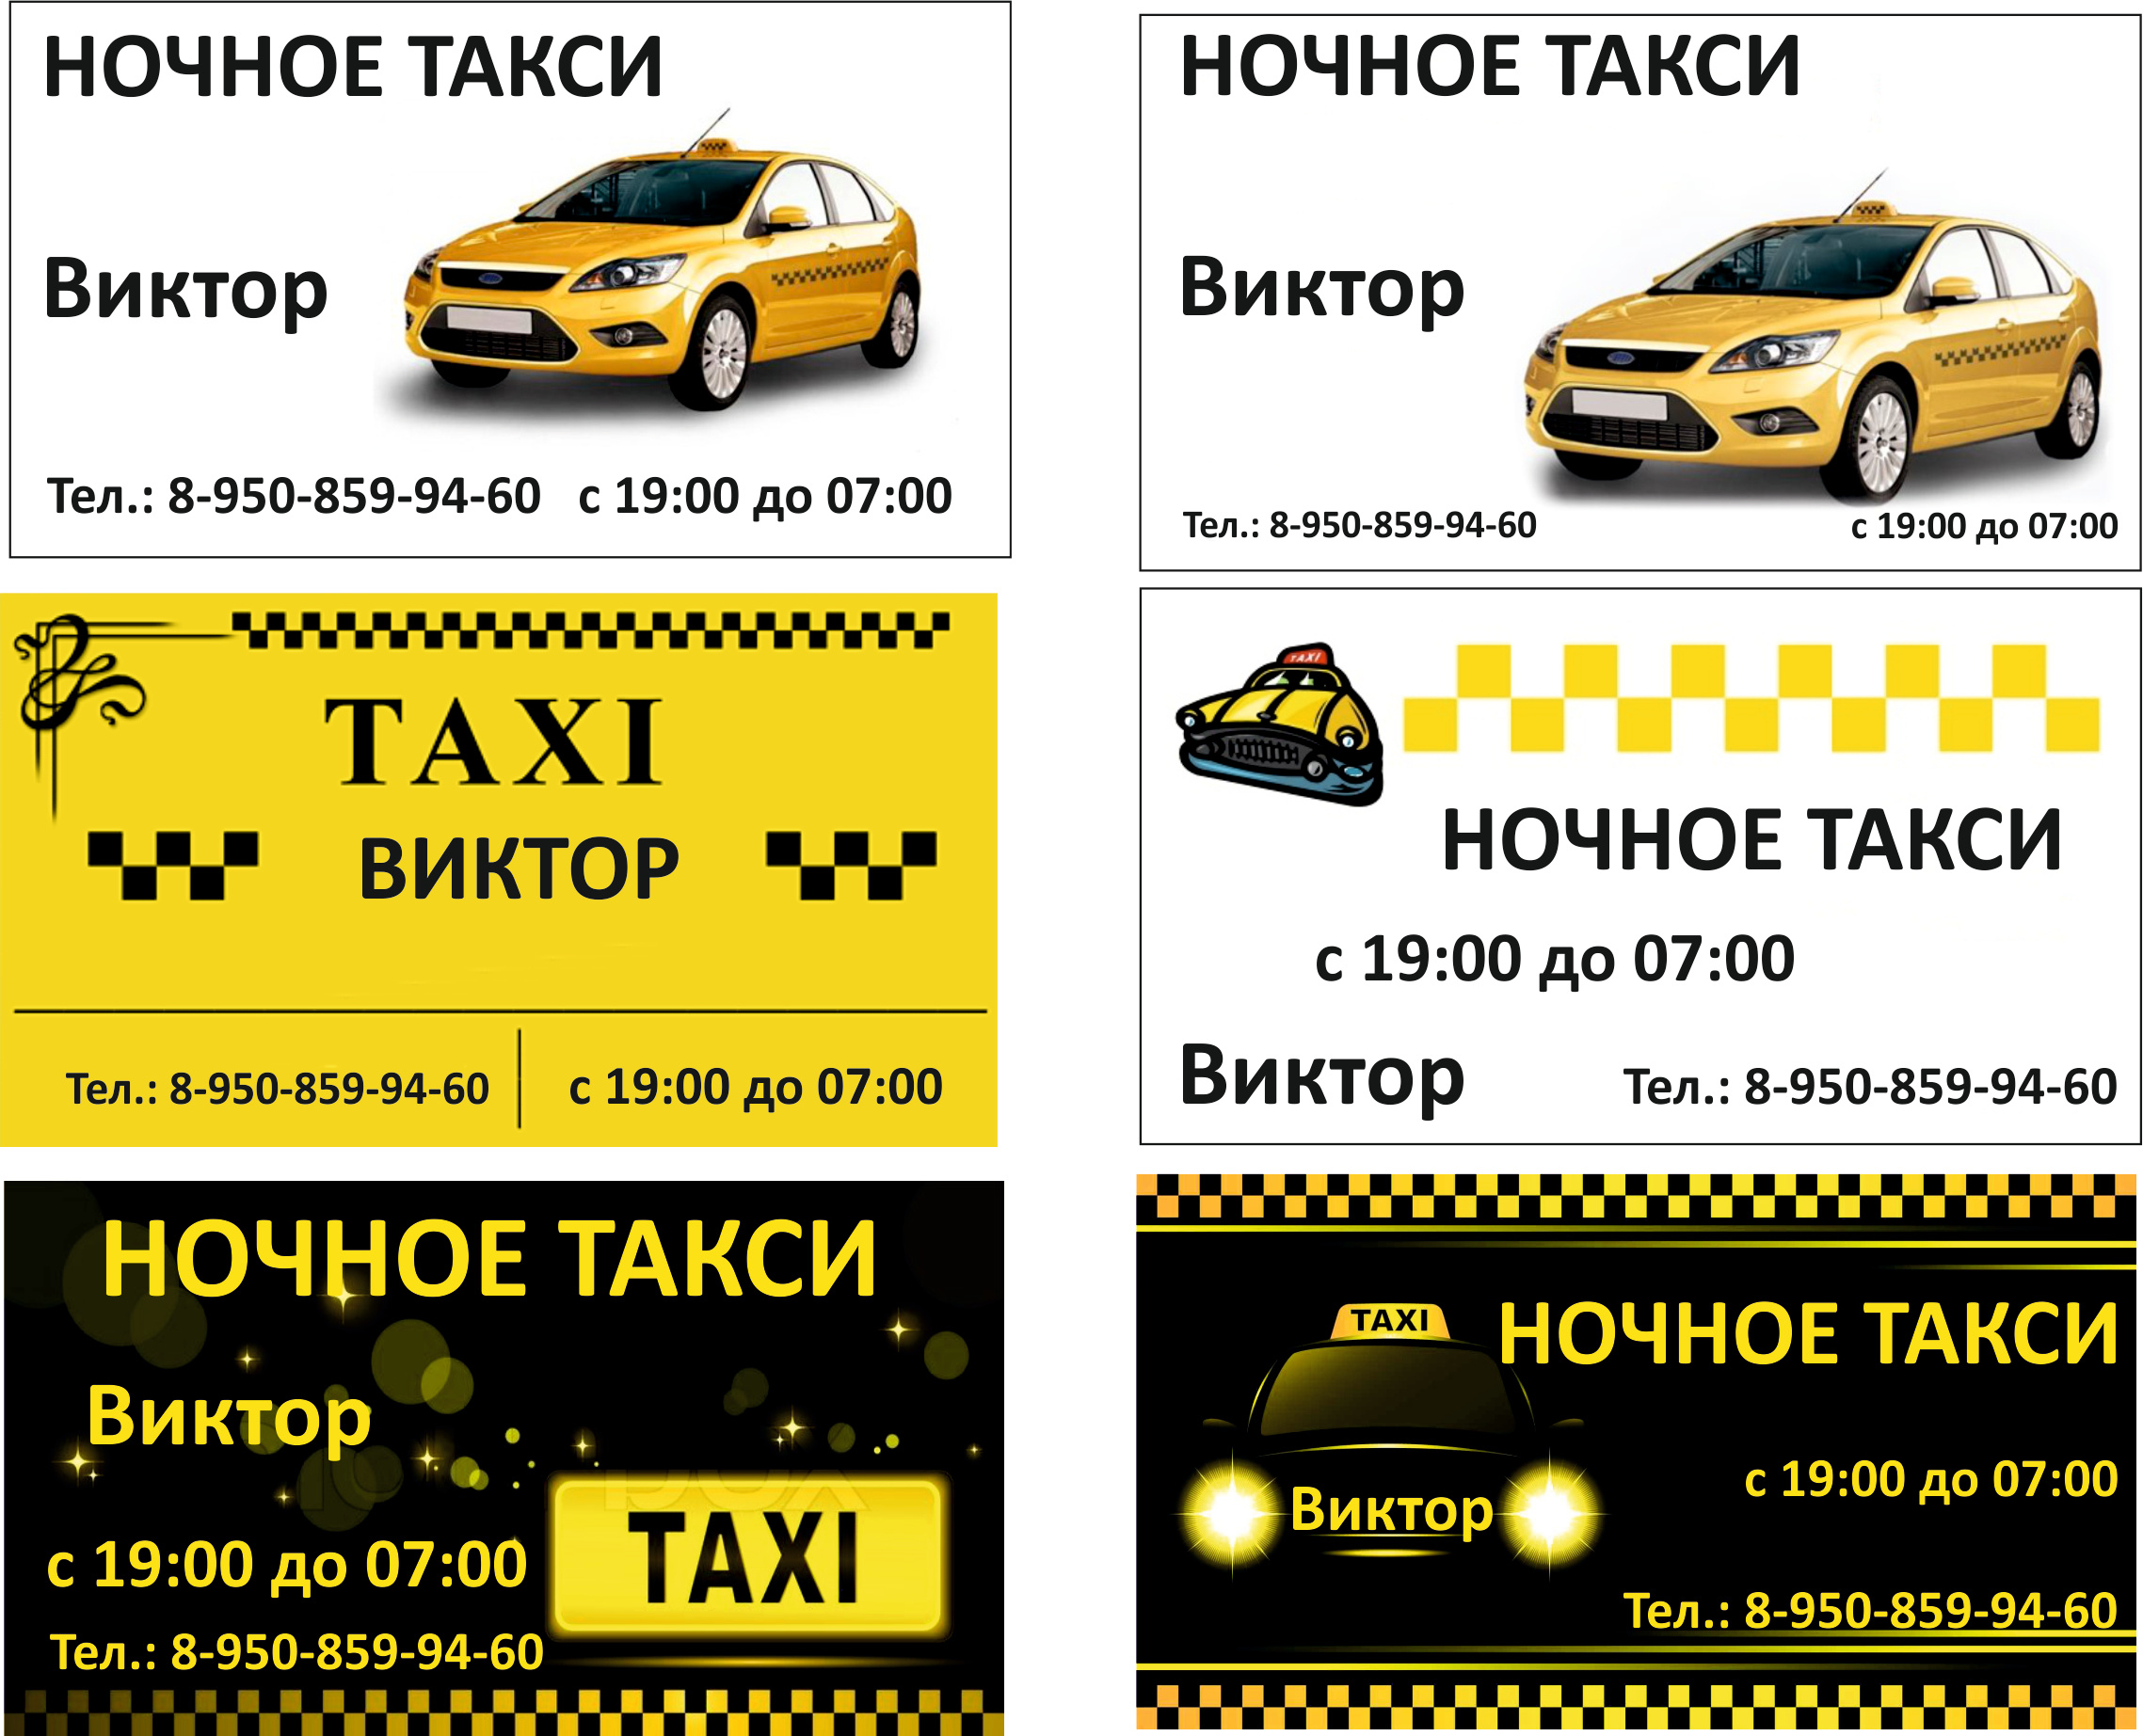 Ночное такси ВИКТОР